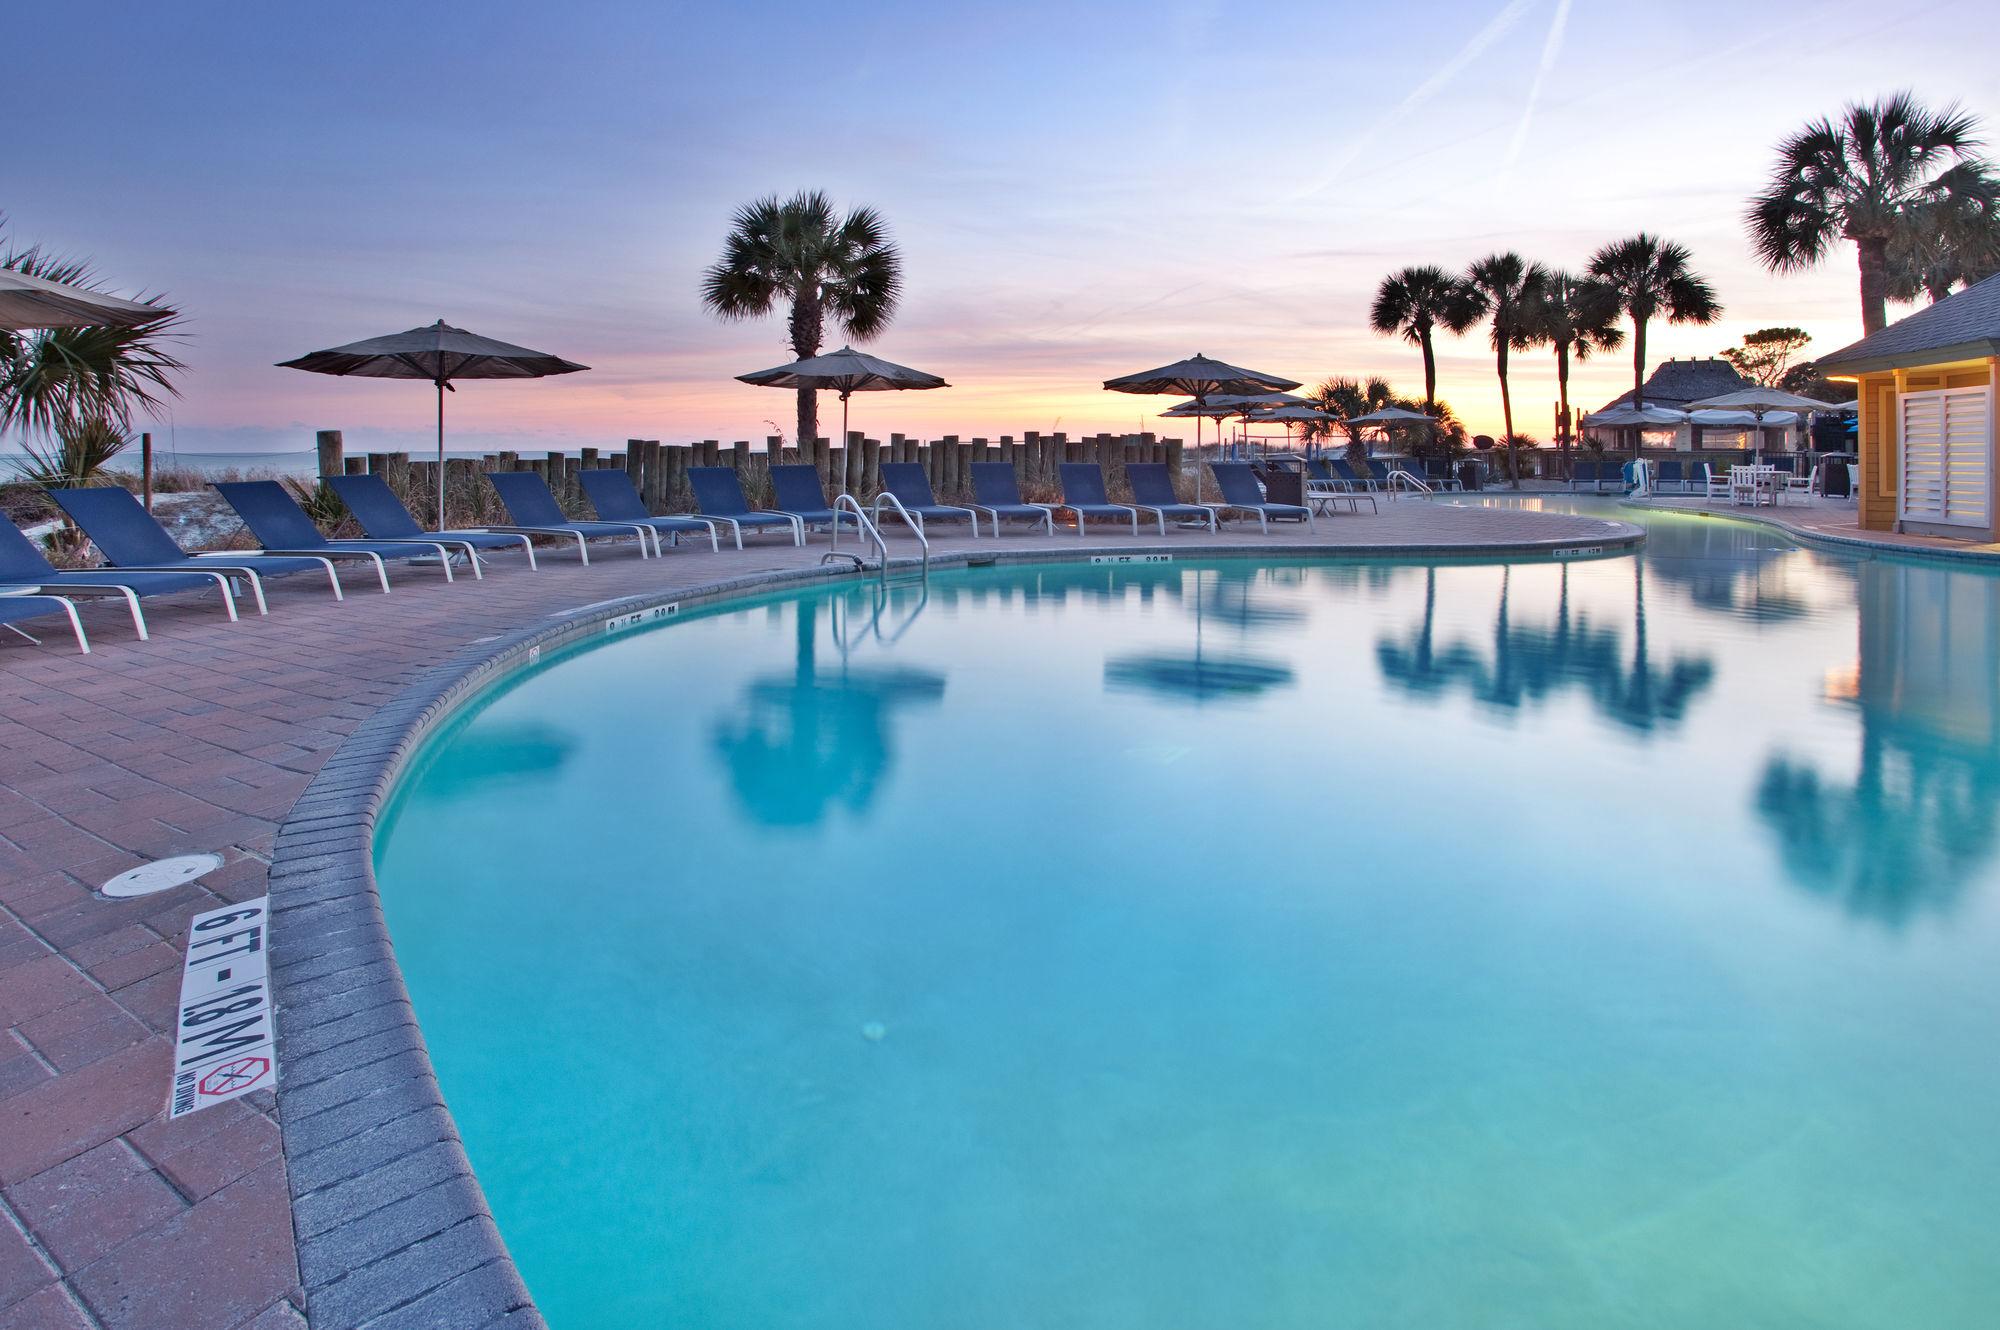 Beach House, a Holiday Inn Resort in Hilton Head, SC